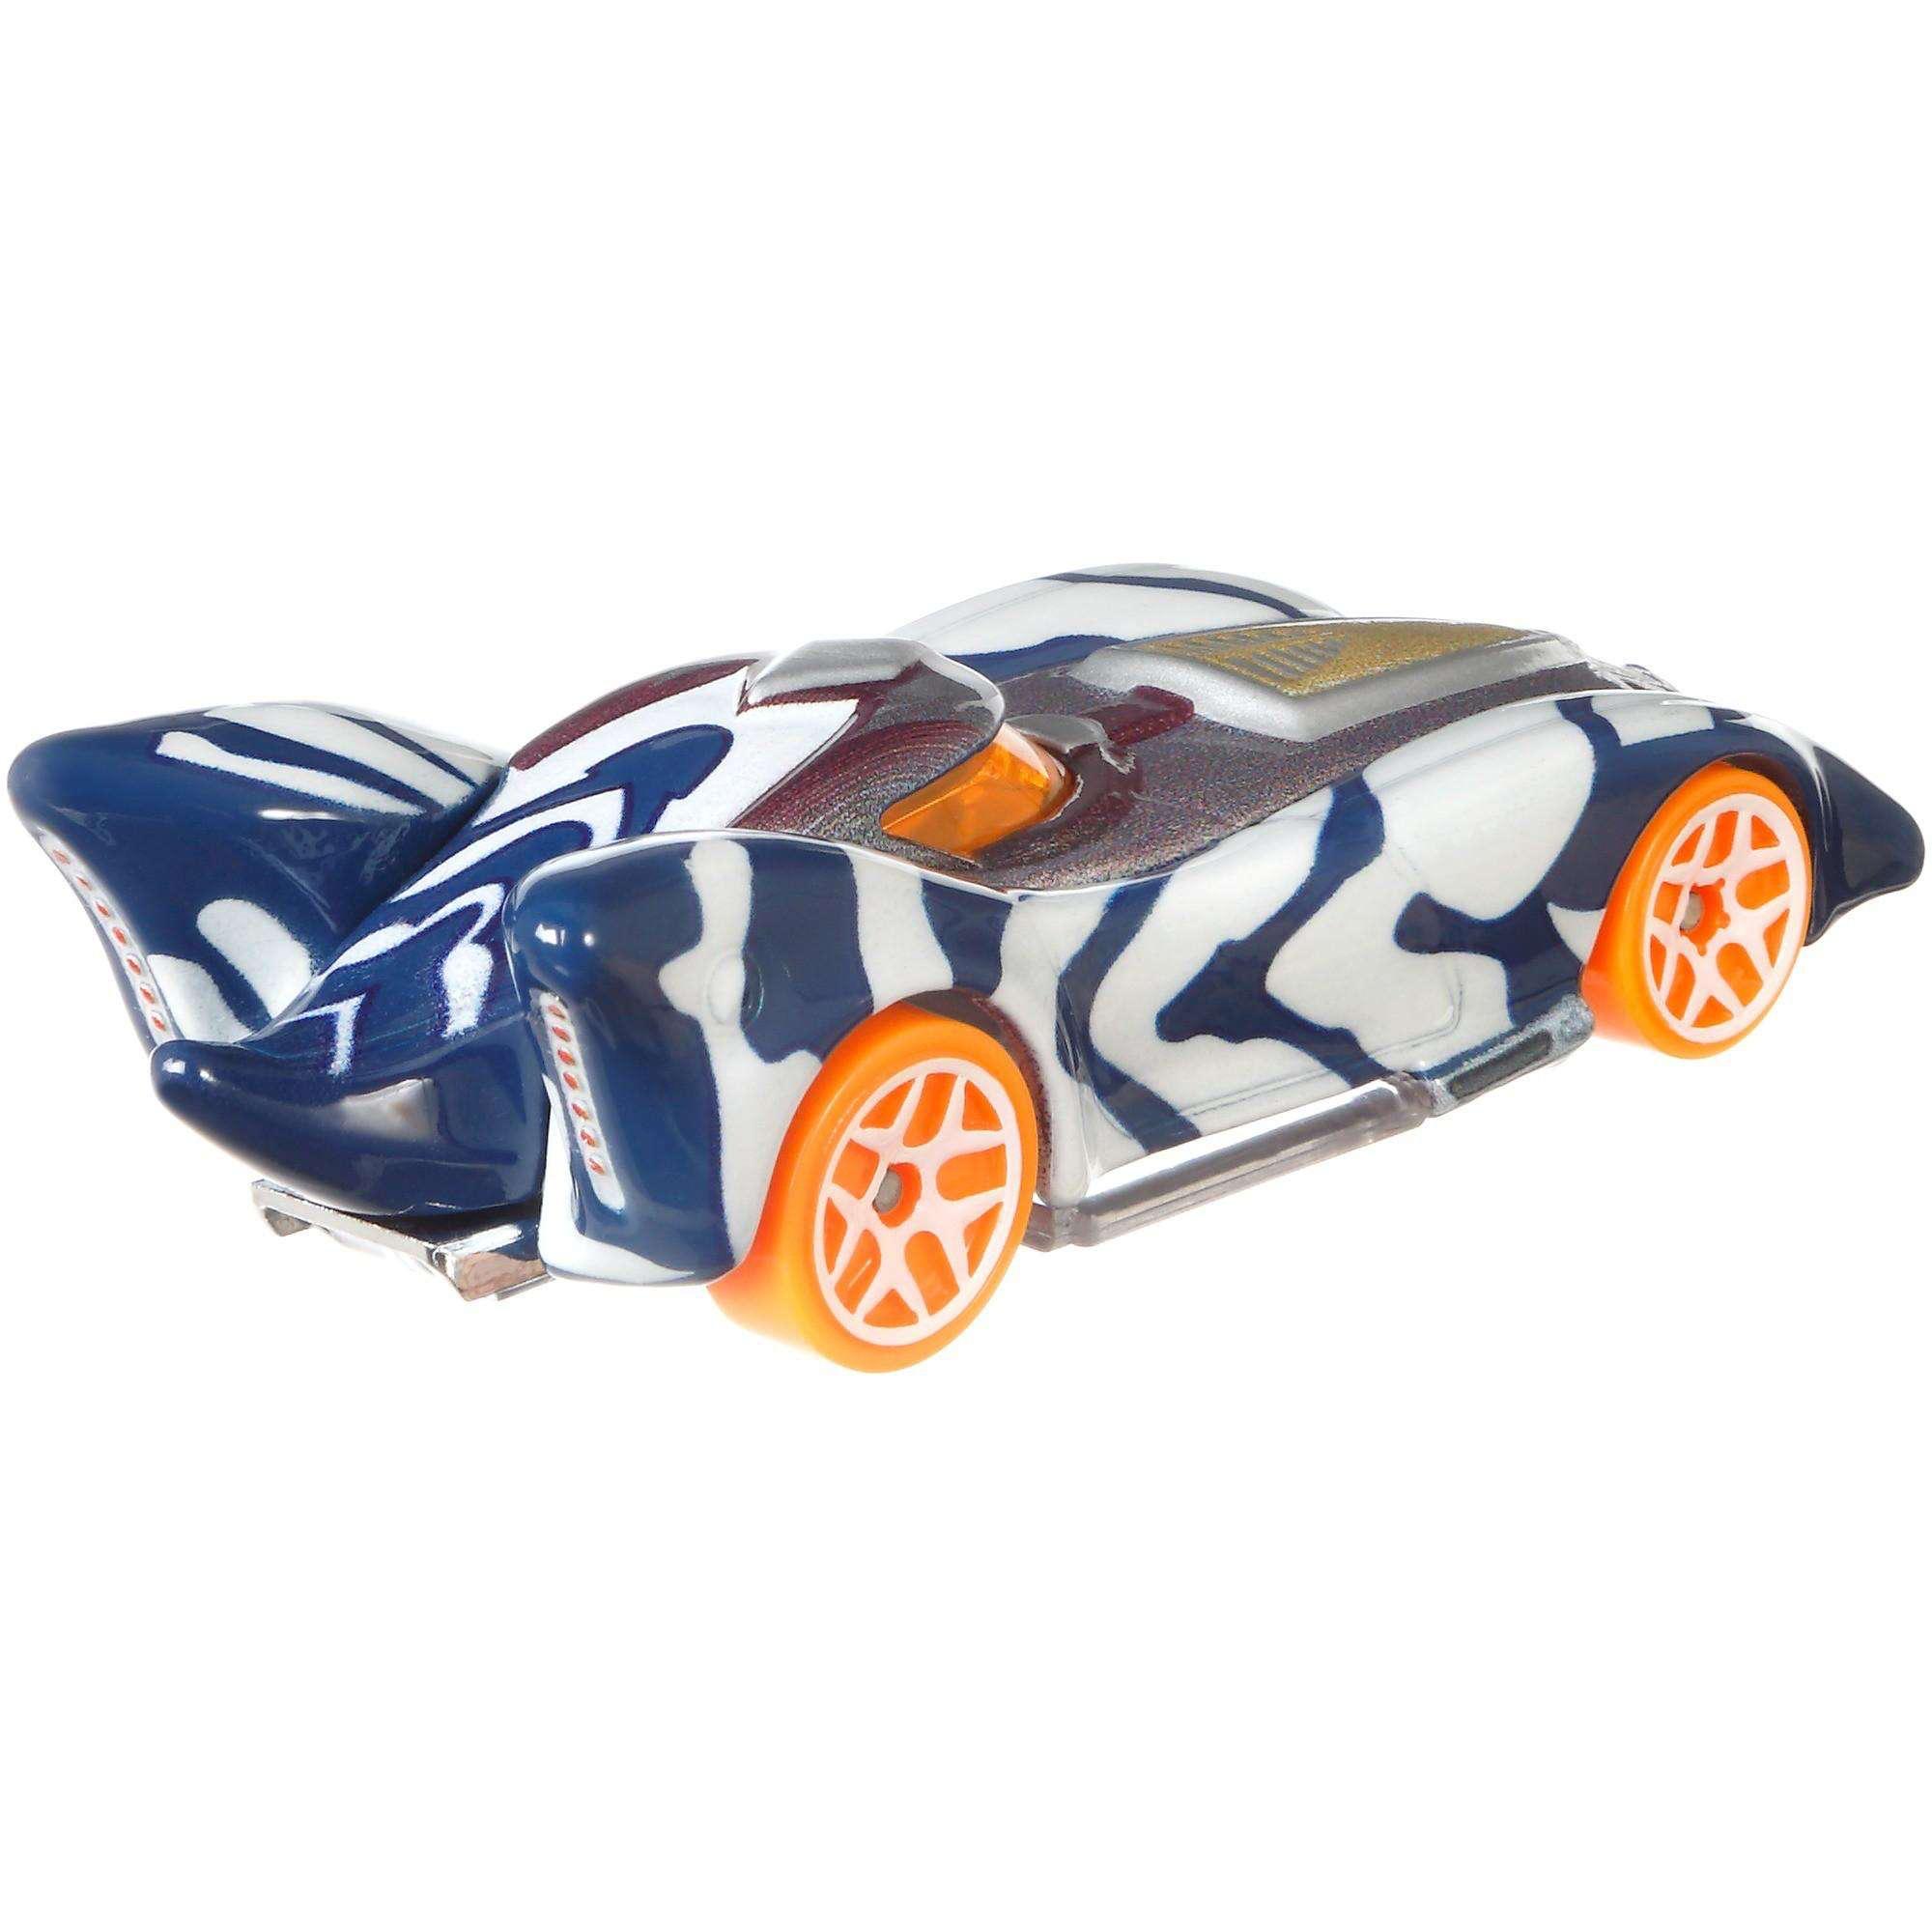 TLJ (SWR) Ahsoka Tano HW Character Car 4